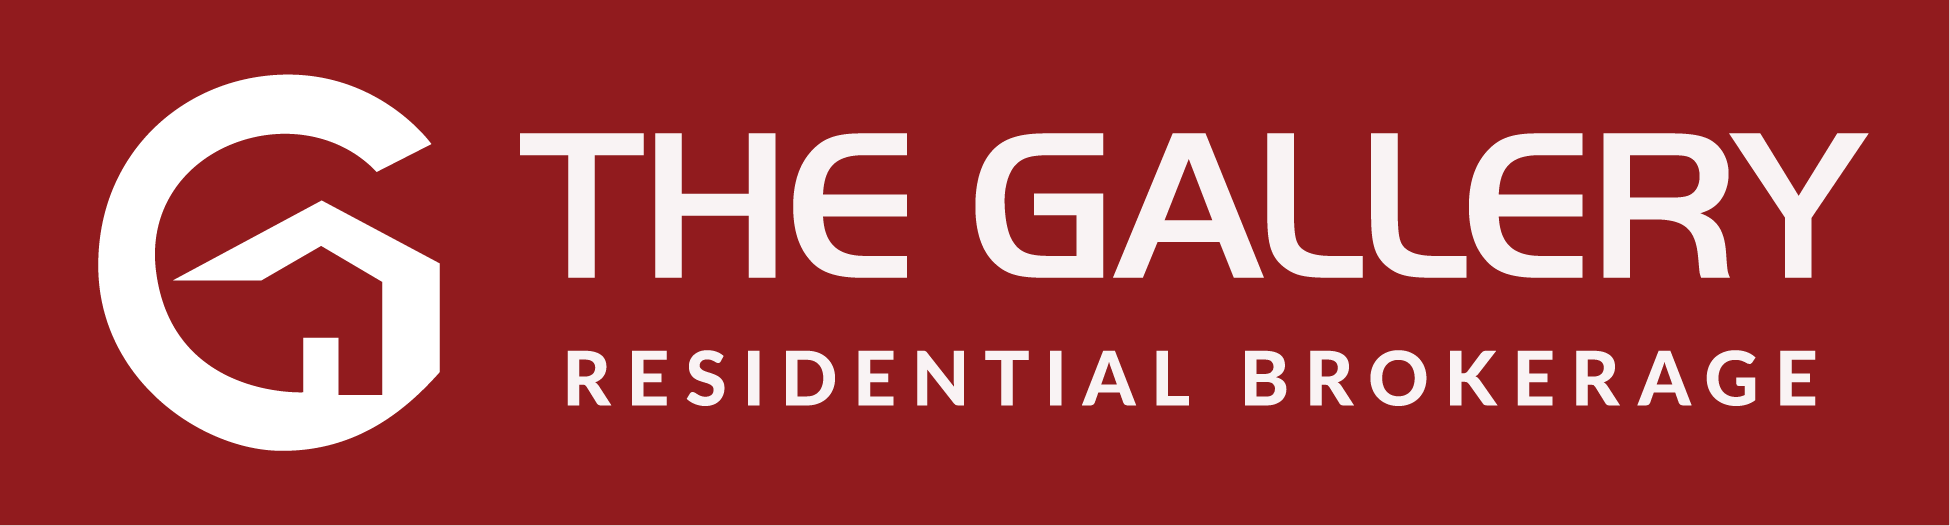 The Gallery Residential Brokerage